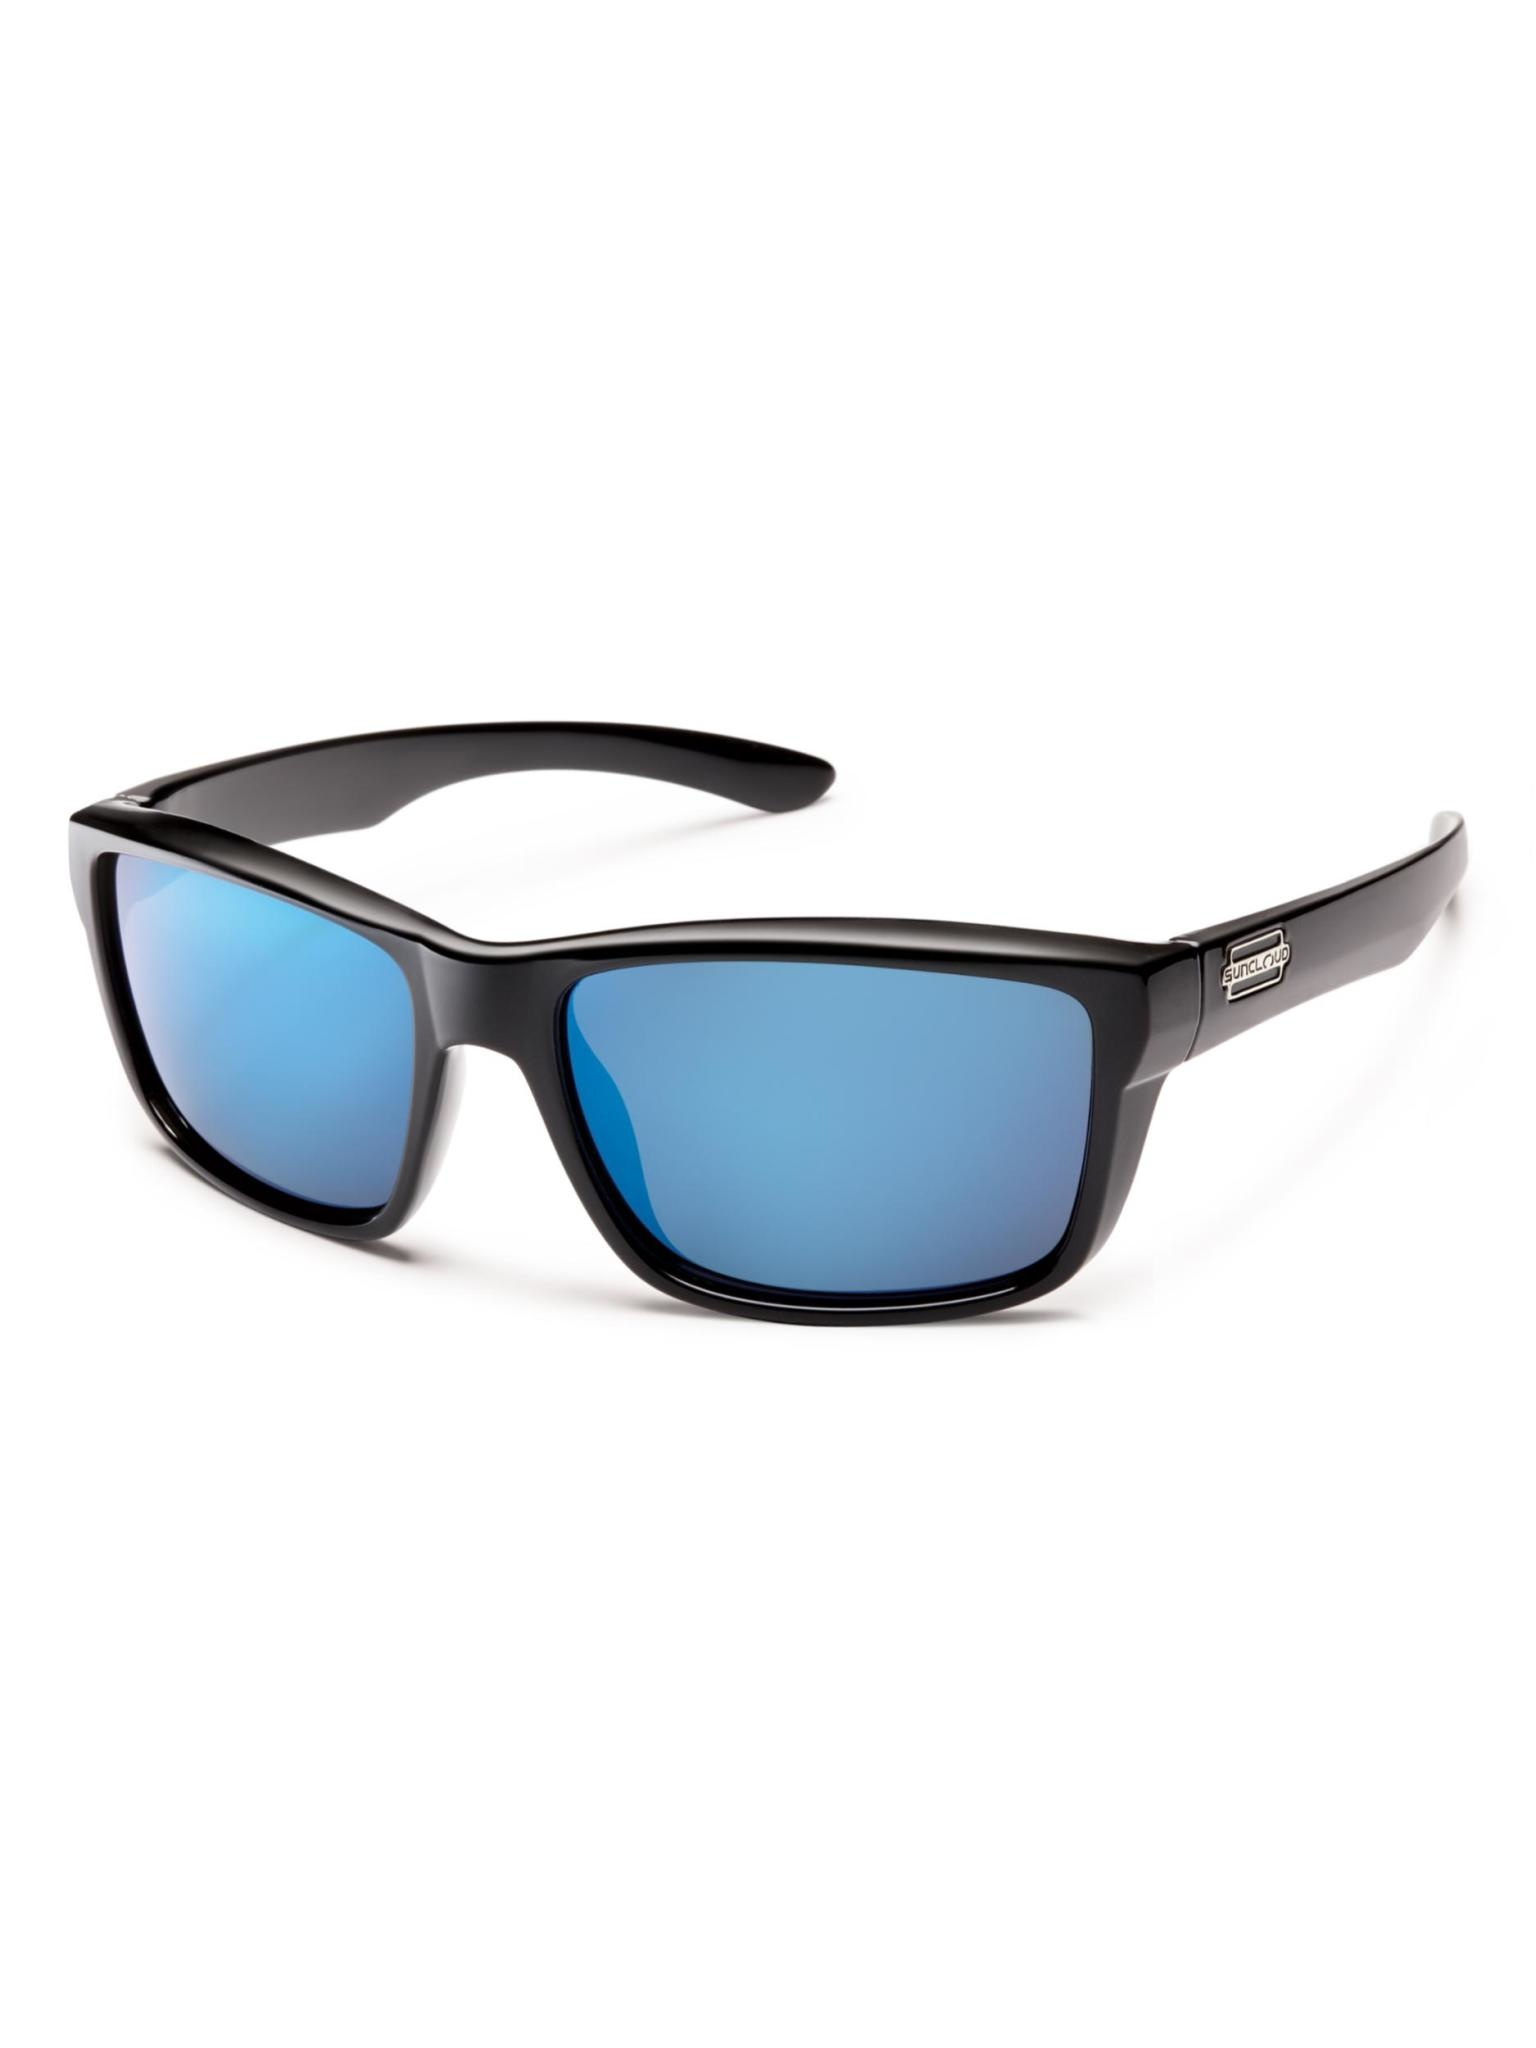 Mayor Sunglasses Black Polarized Blue Mirror